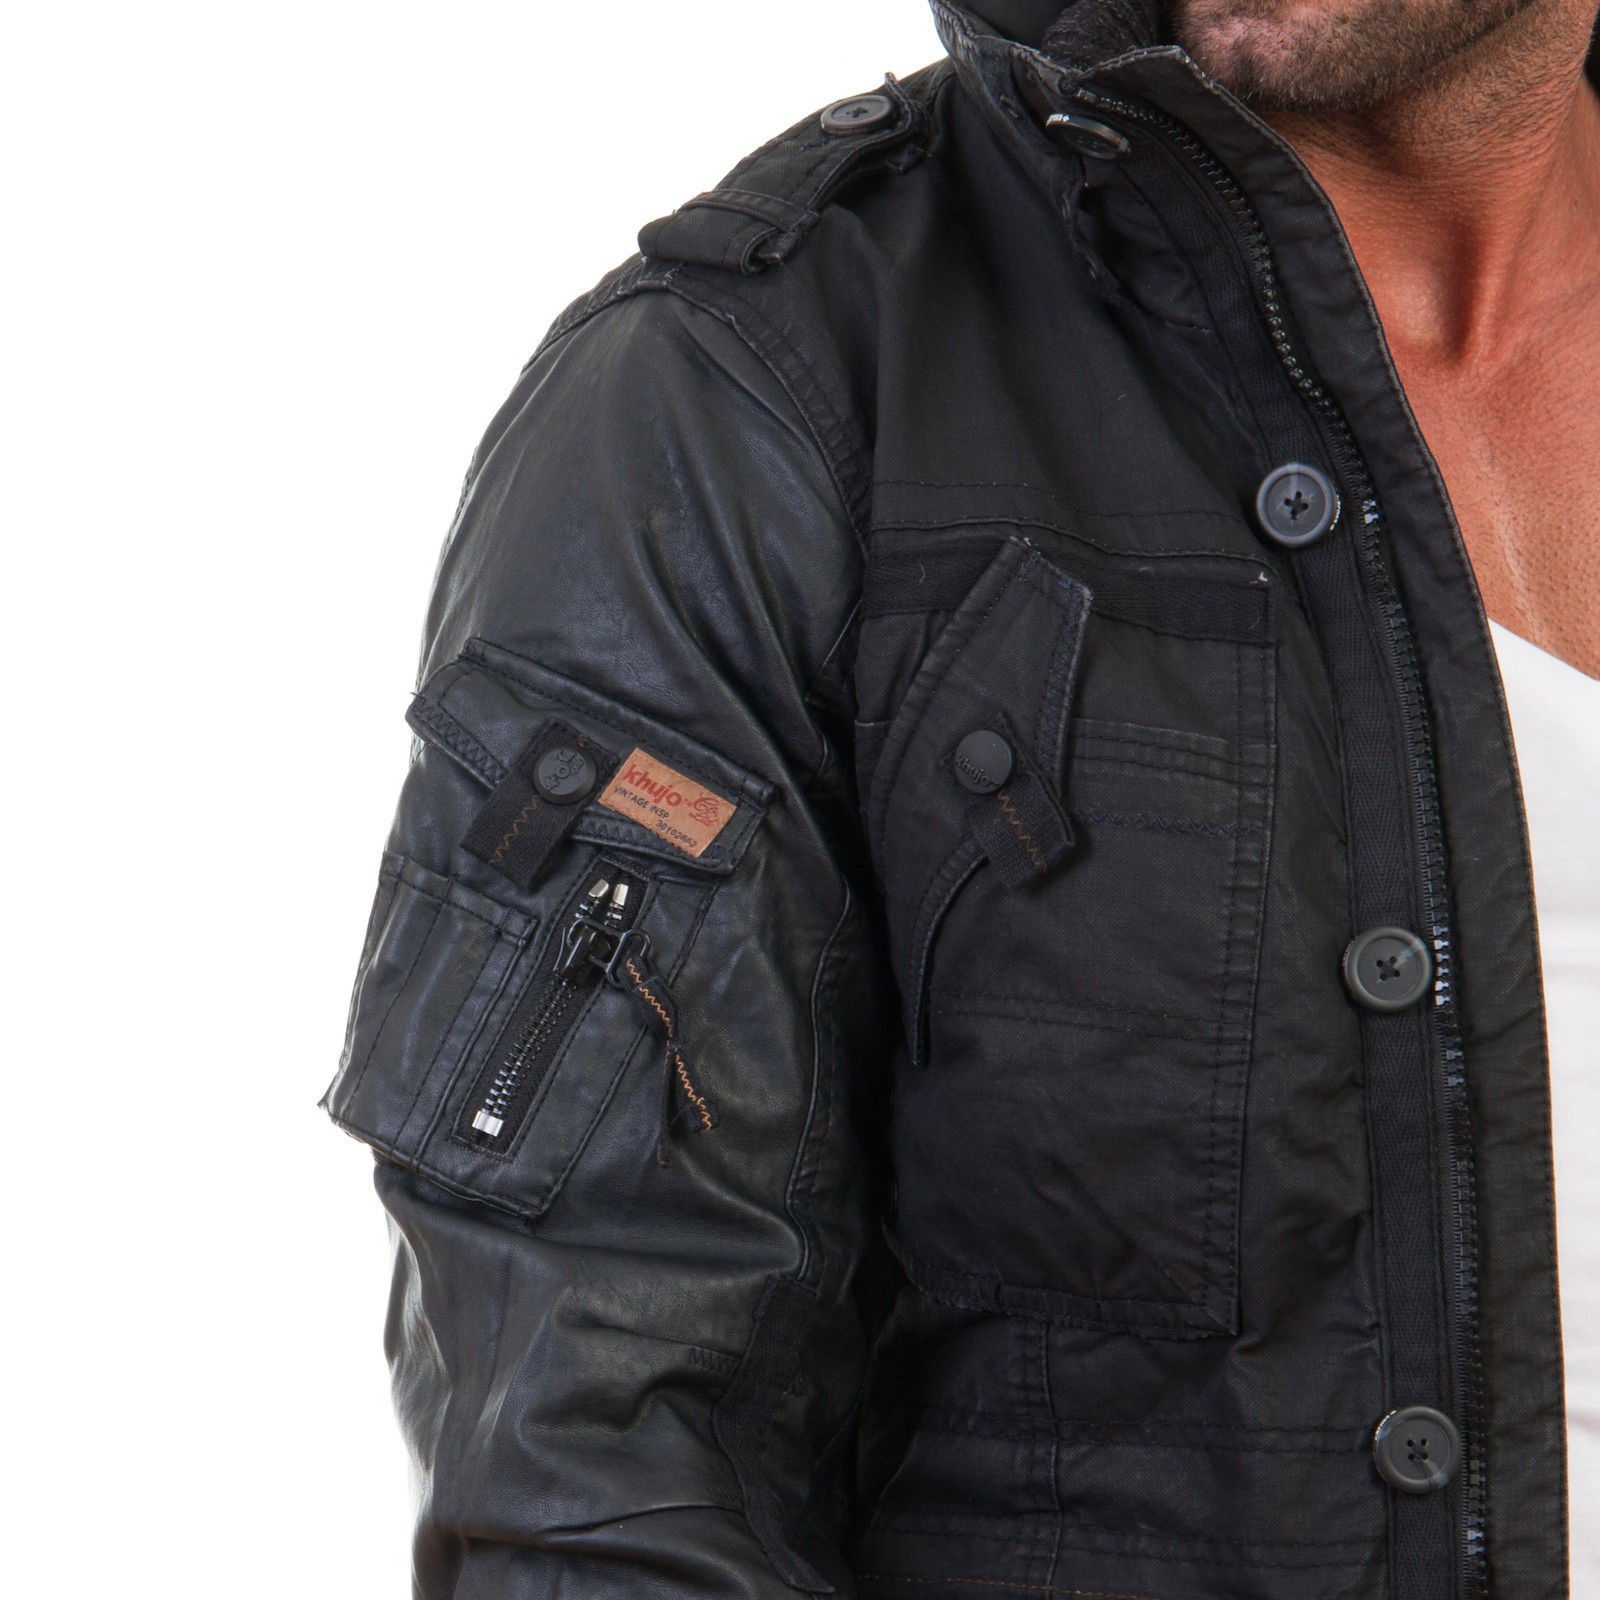 khujo men 39 s winter jacket pu faux leather jacket tomboy. Black Bedroom Furniture Sets. Home Design Ideas